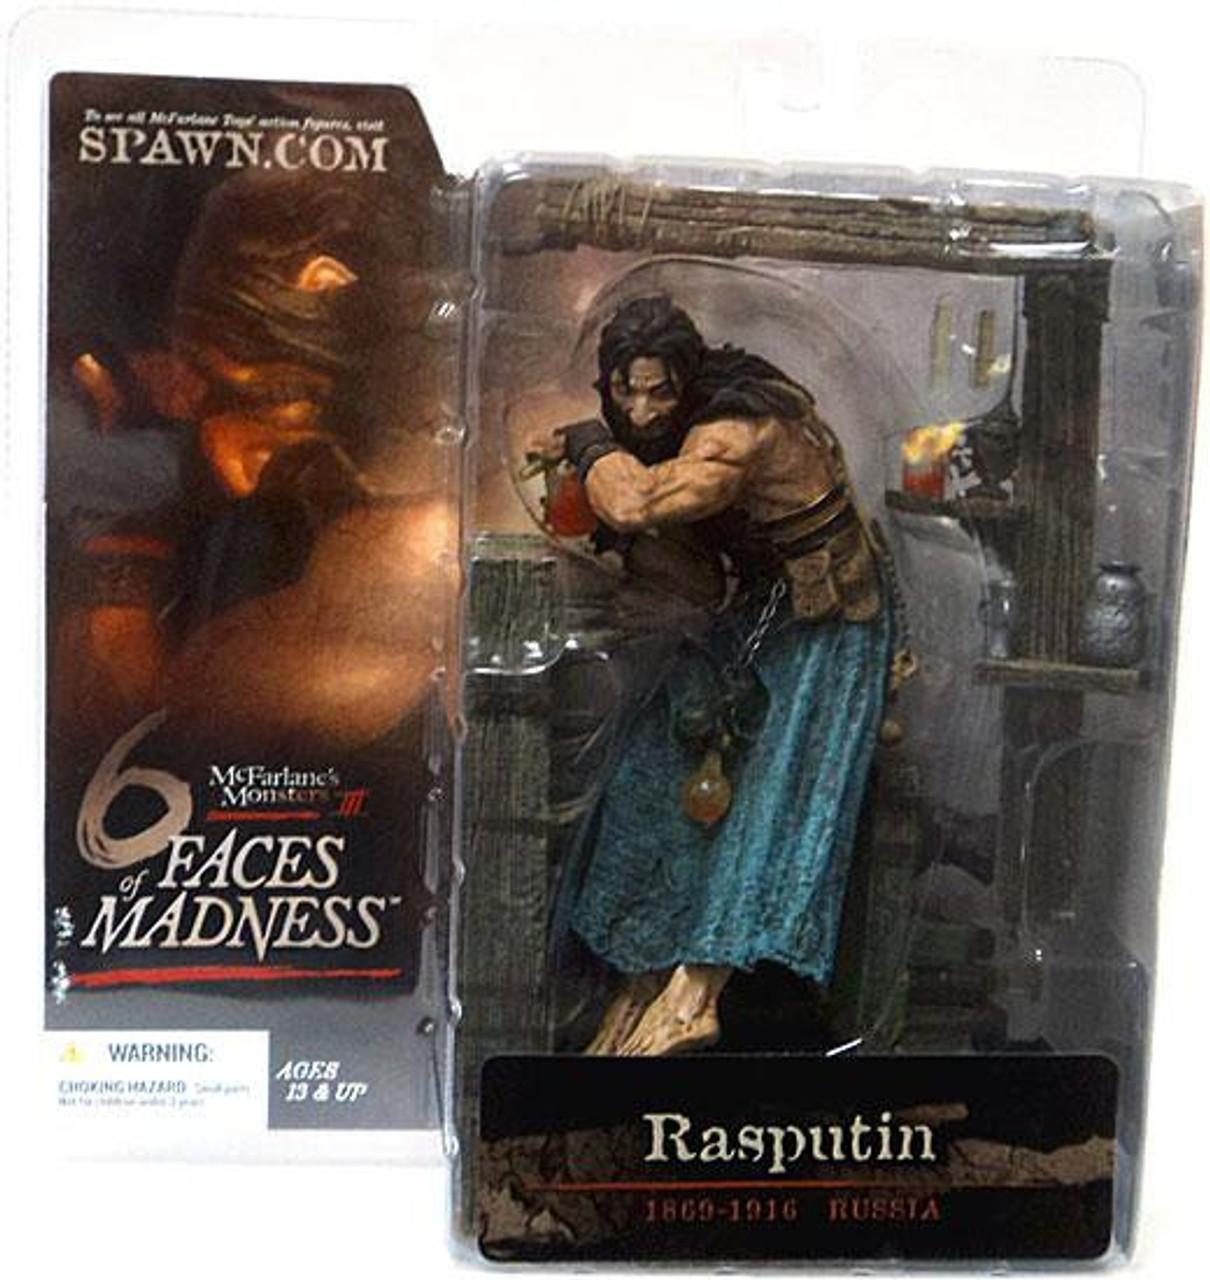 McFarlane Toys McFarlane's Monsters 6 Faces of Madness Rasputin Action Figure